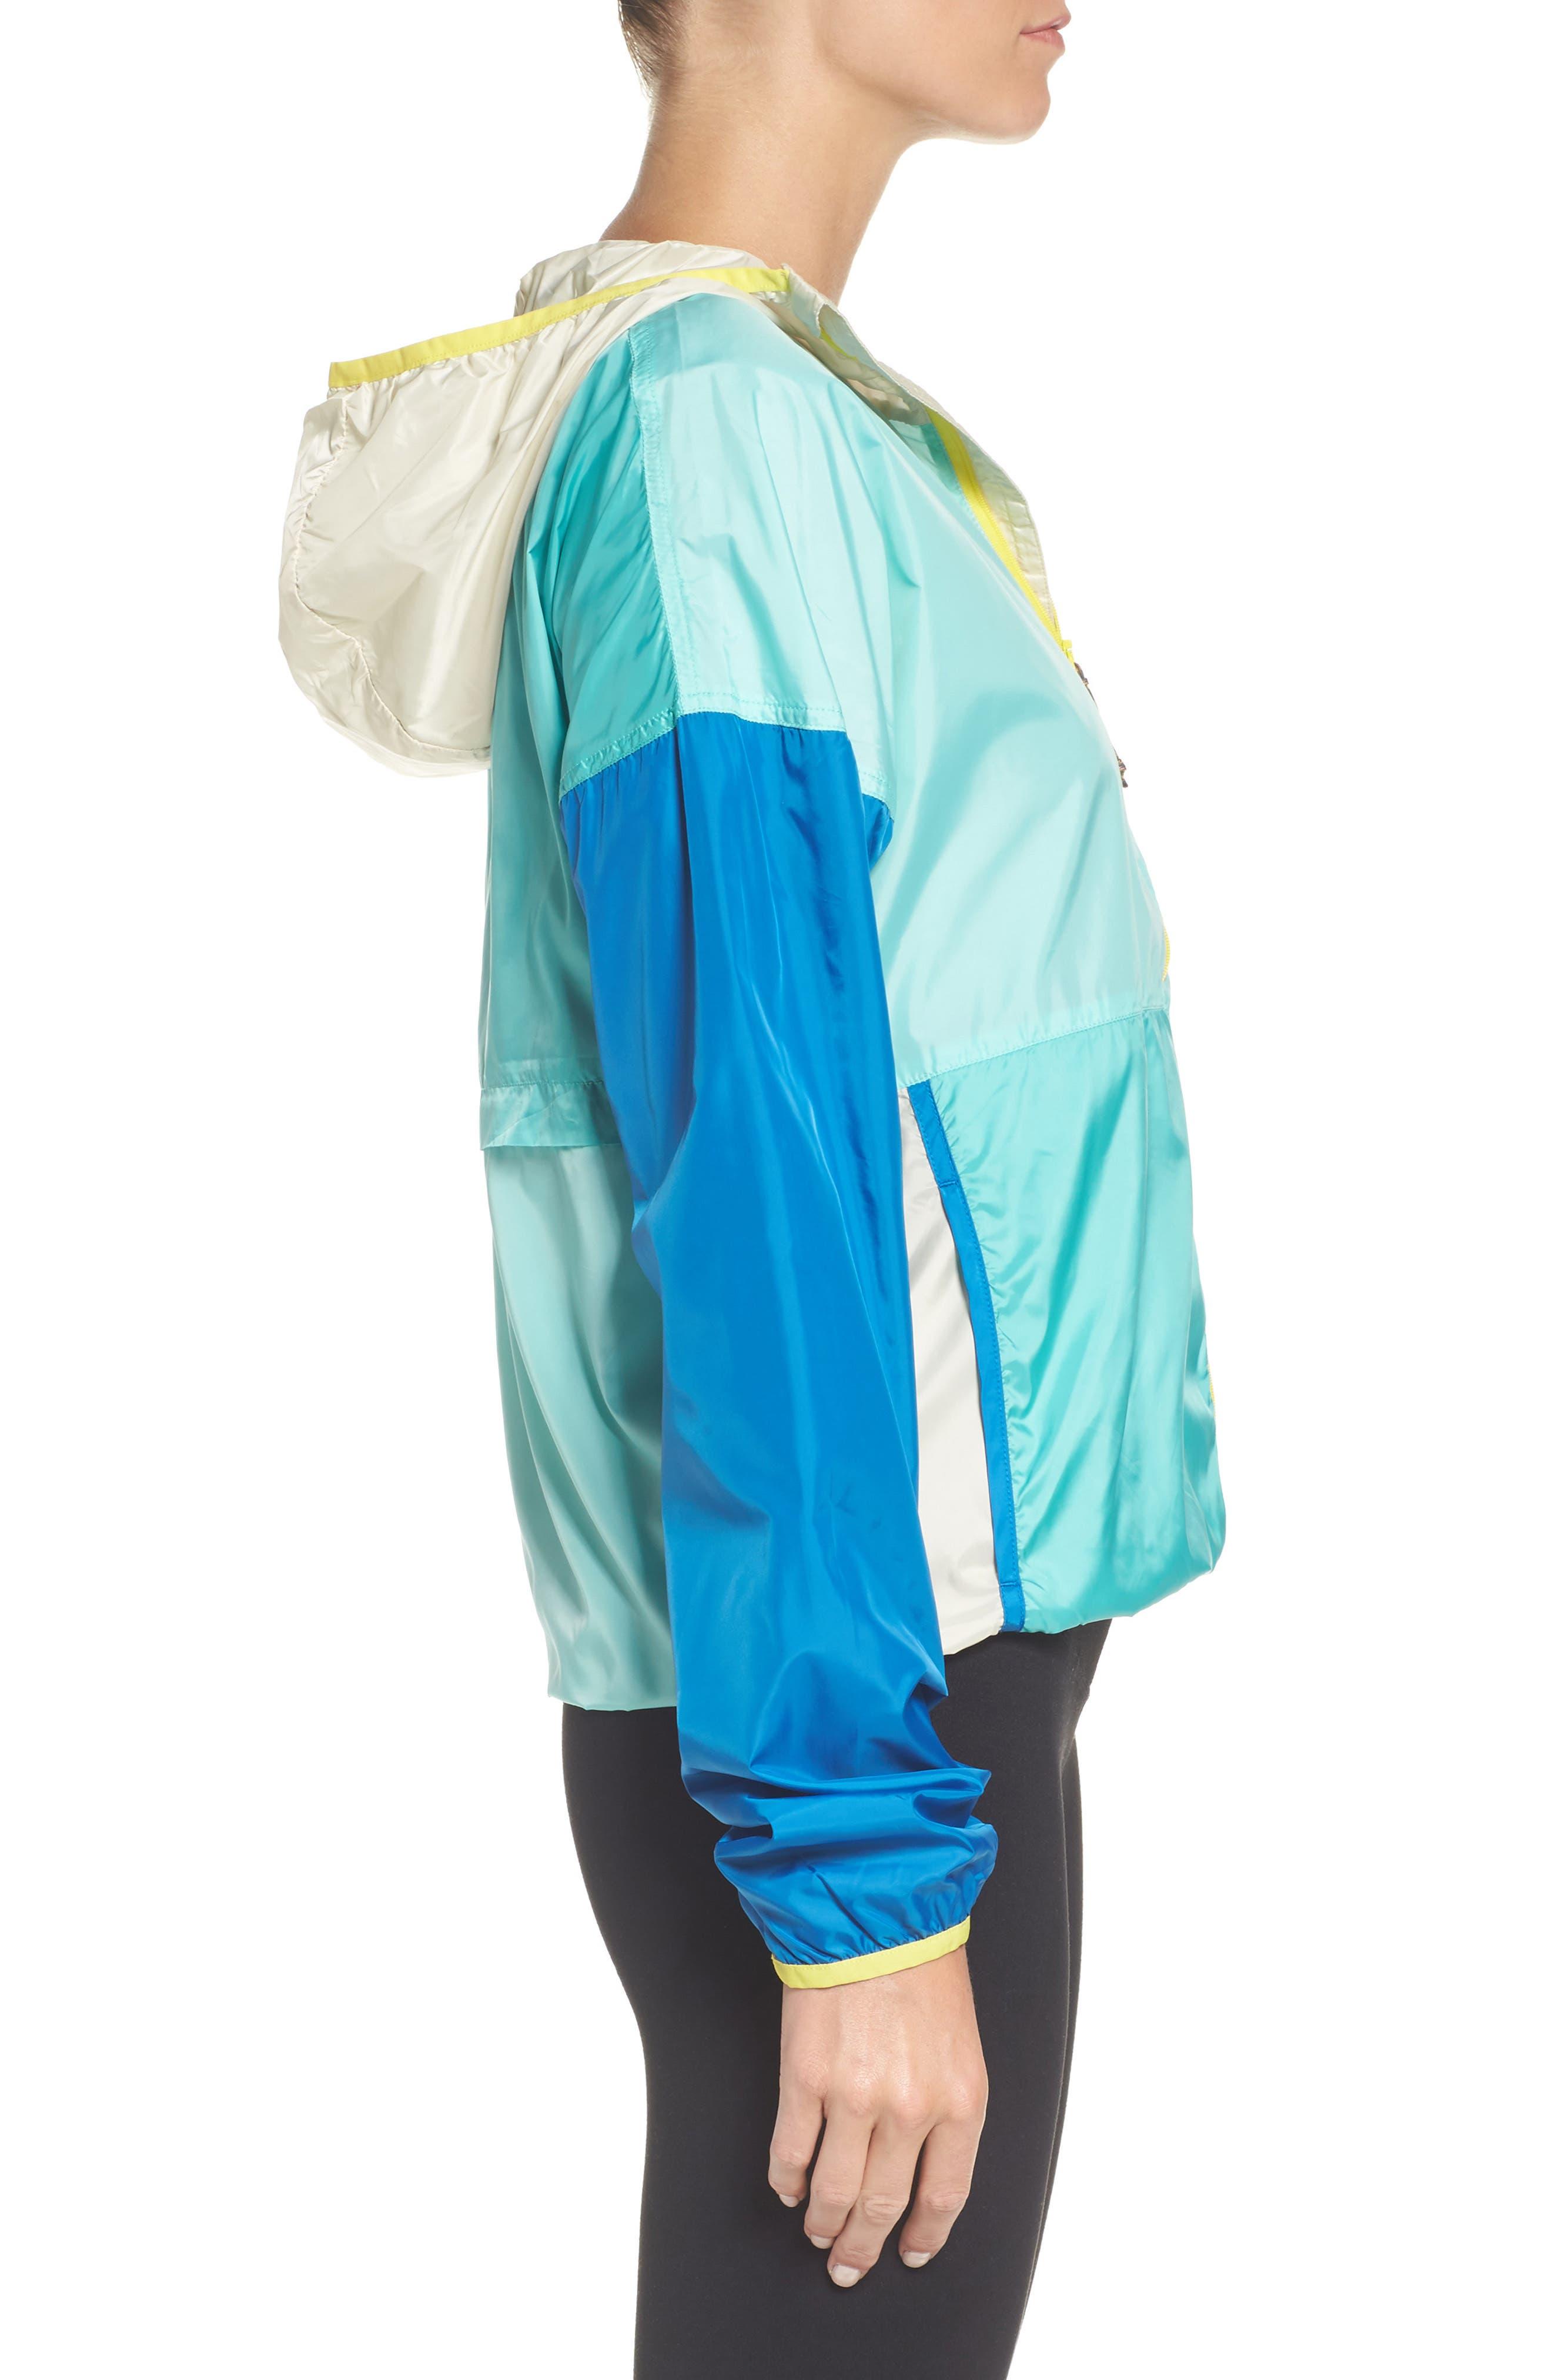 Teca Packable Water Resistant Windbreaker Jacket,                             Alternate thumbnail 3, color,                             Blue Crush